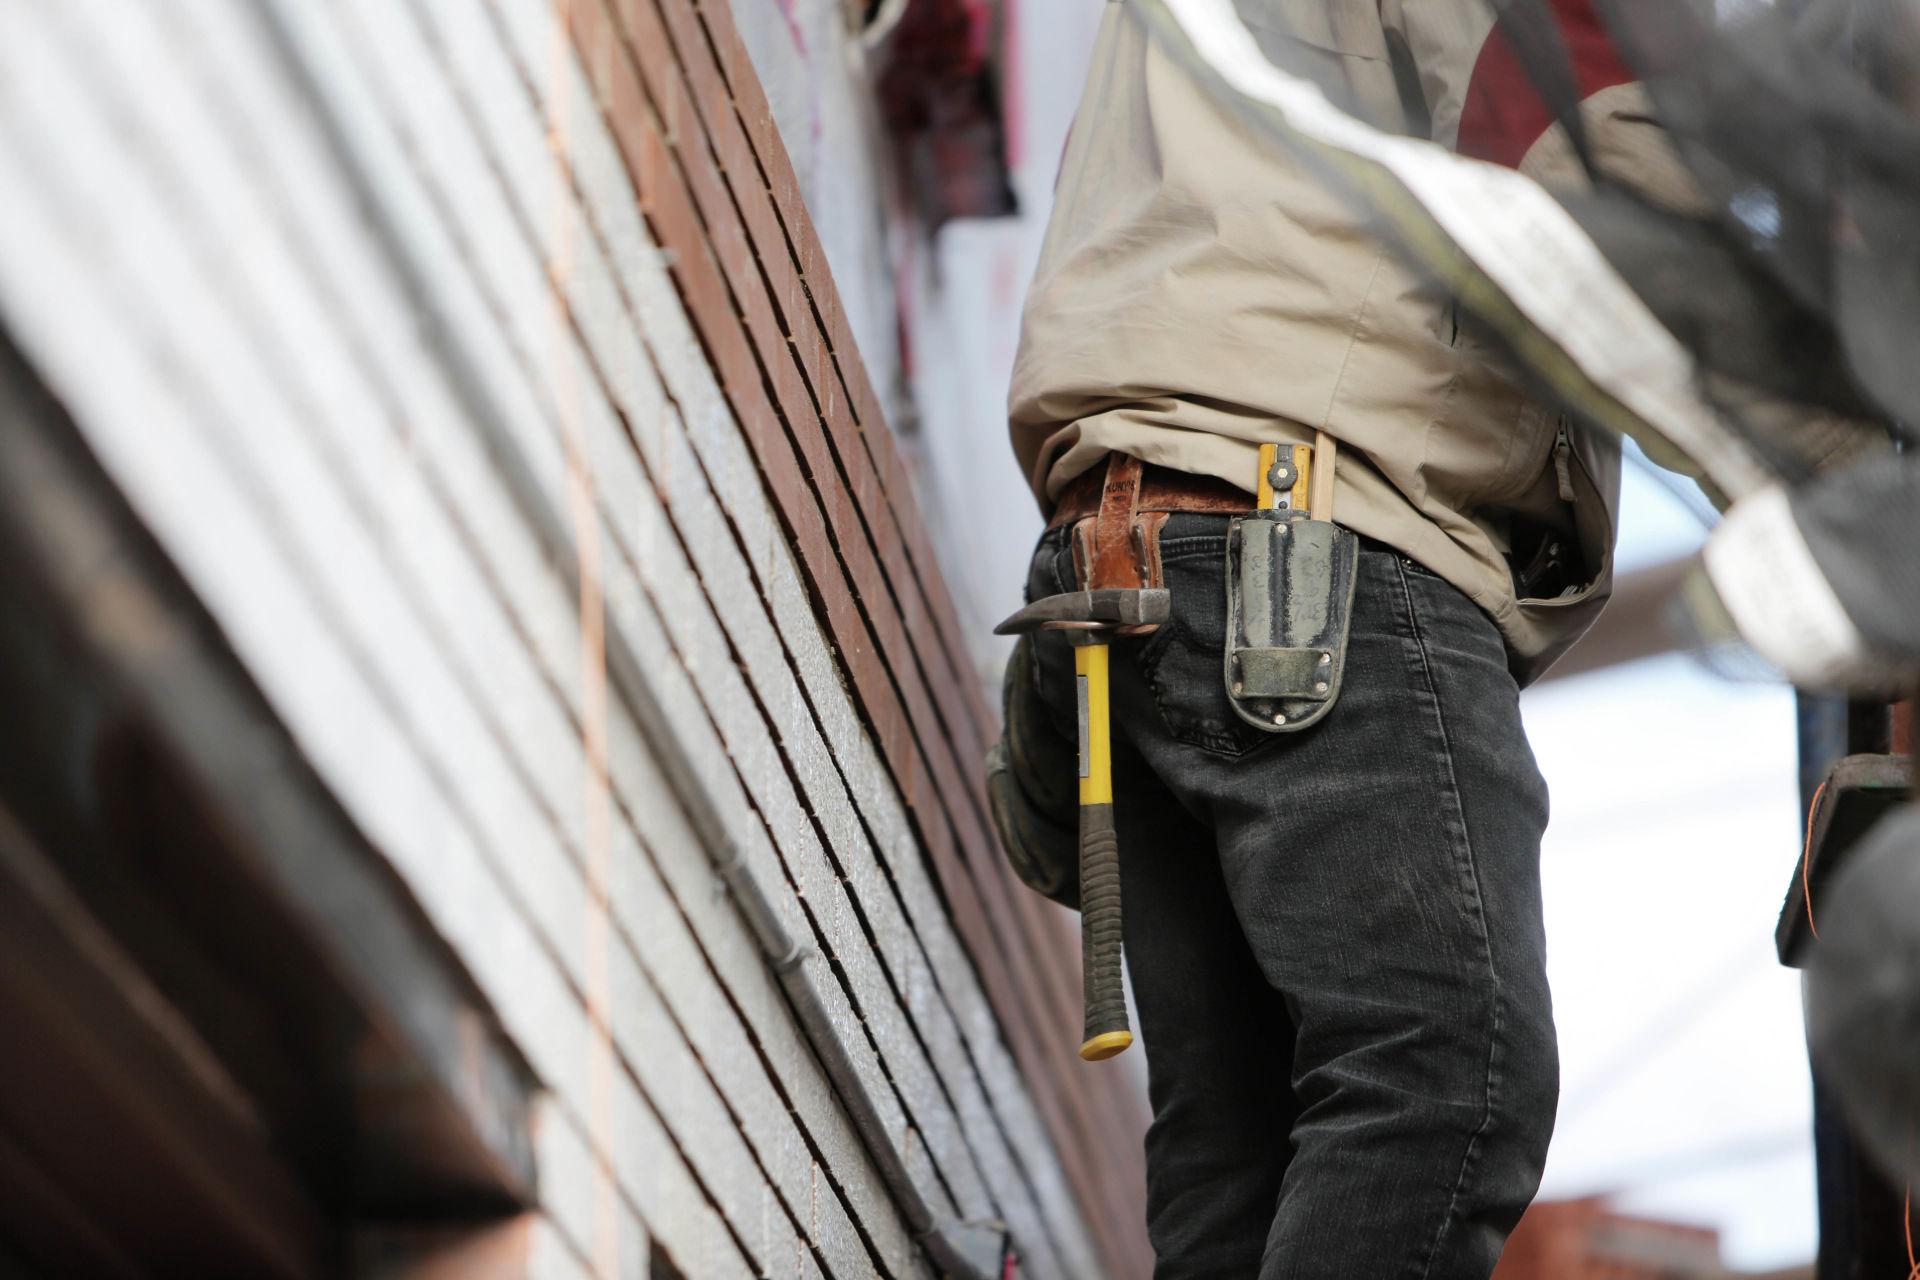 Annual Gulf Coast Home Maintenance Checklist